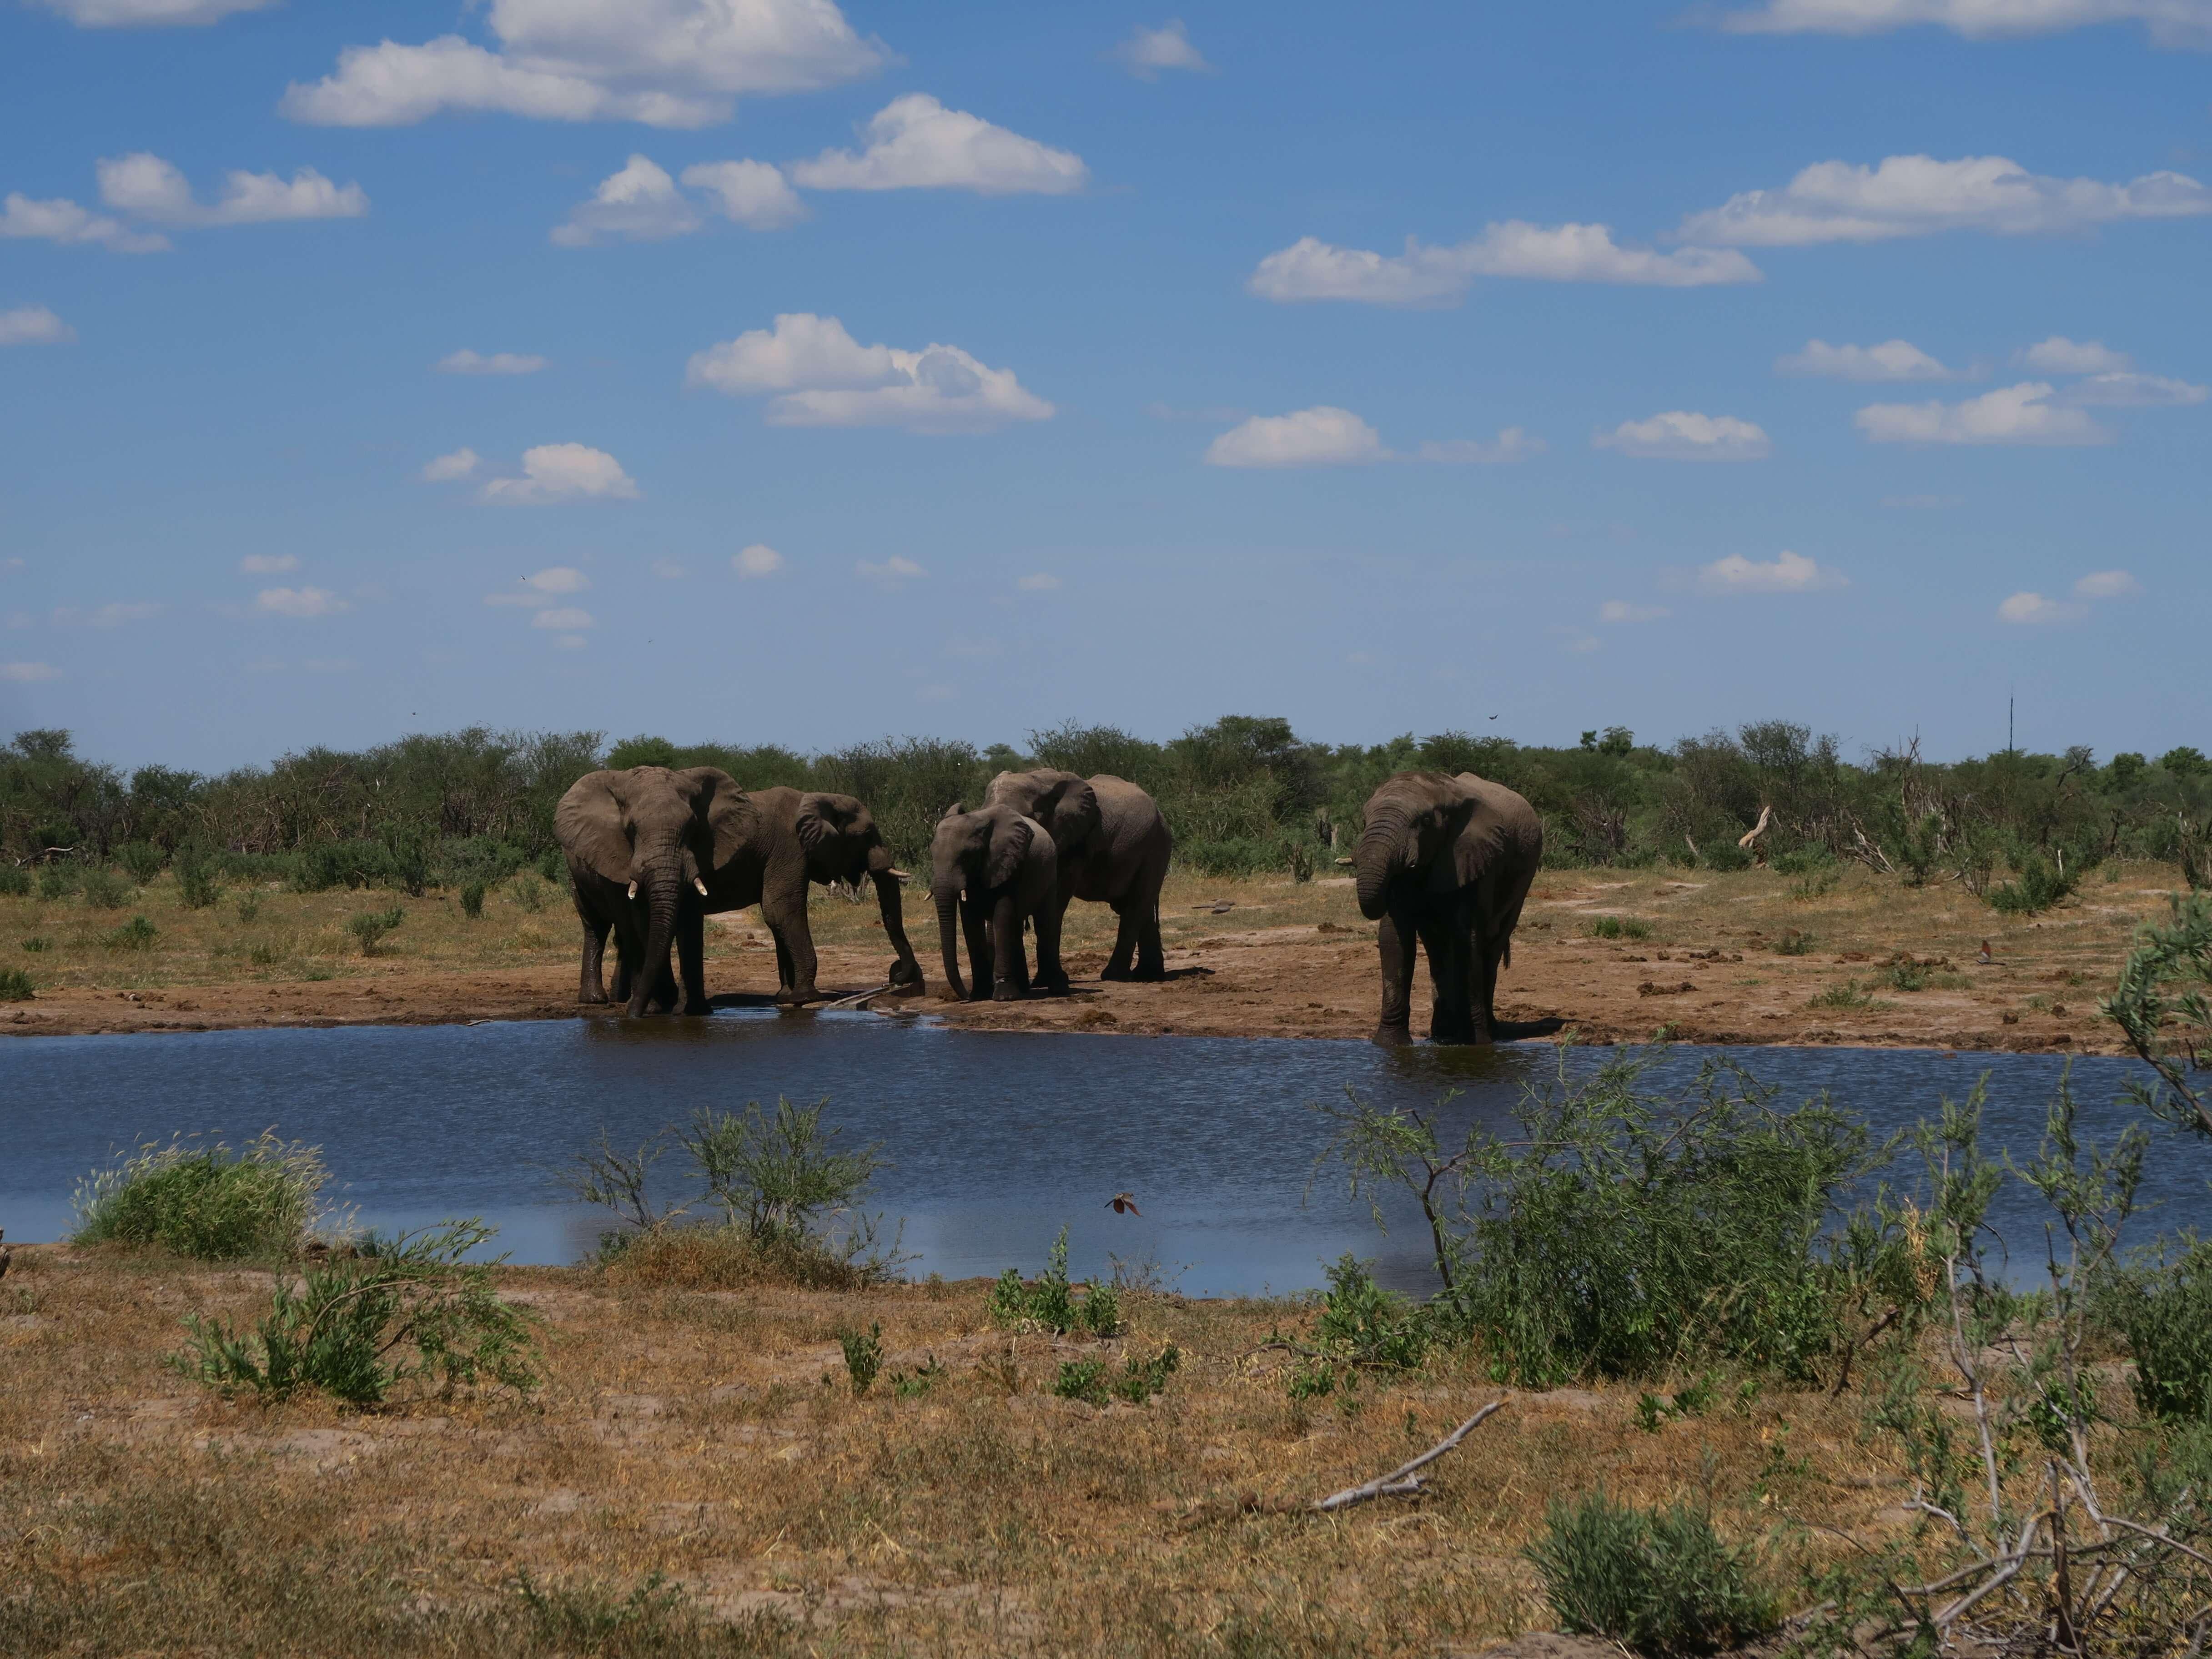 Olifanten bij Xaka waterhole in Central Kalahari Game Reserve Botswana